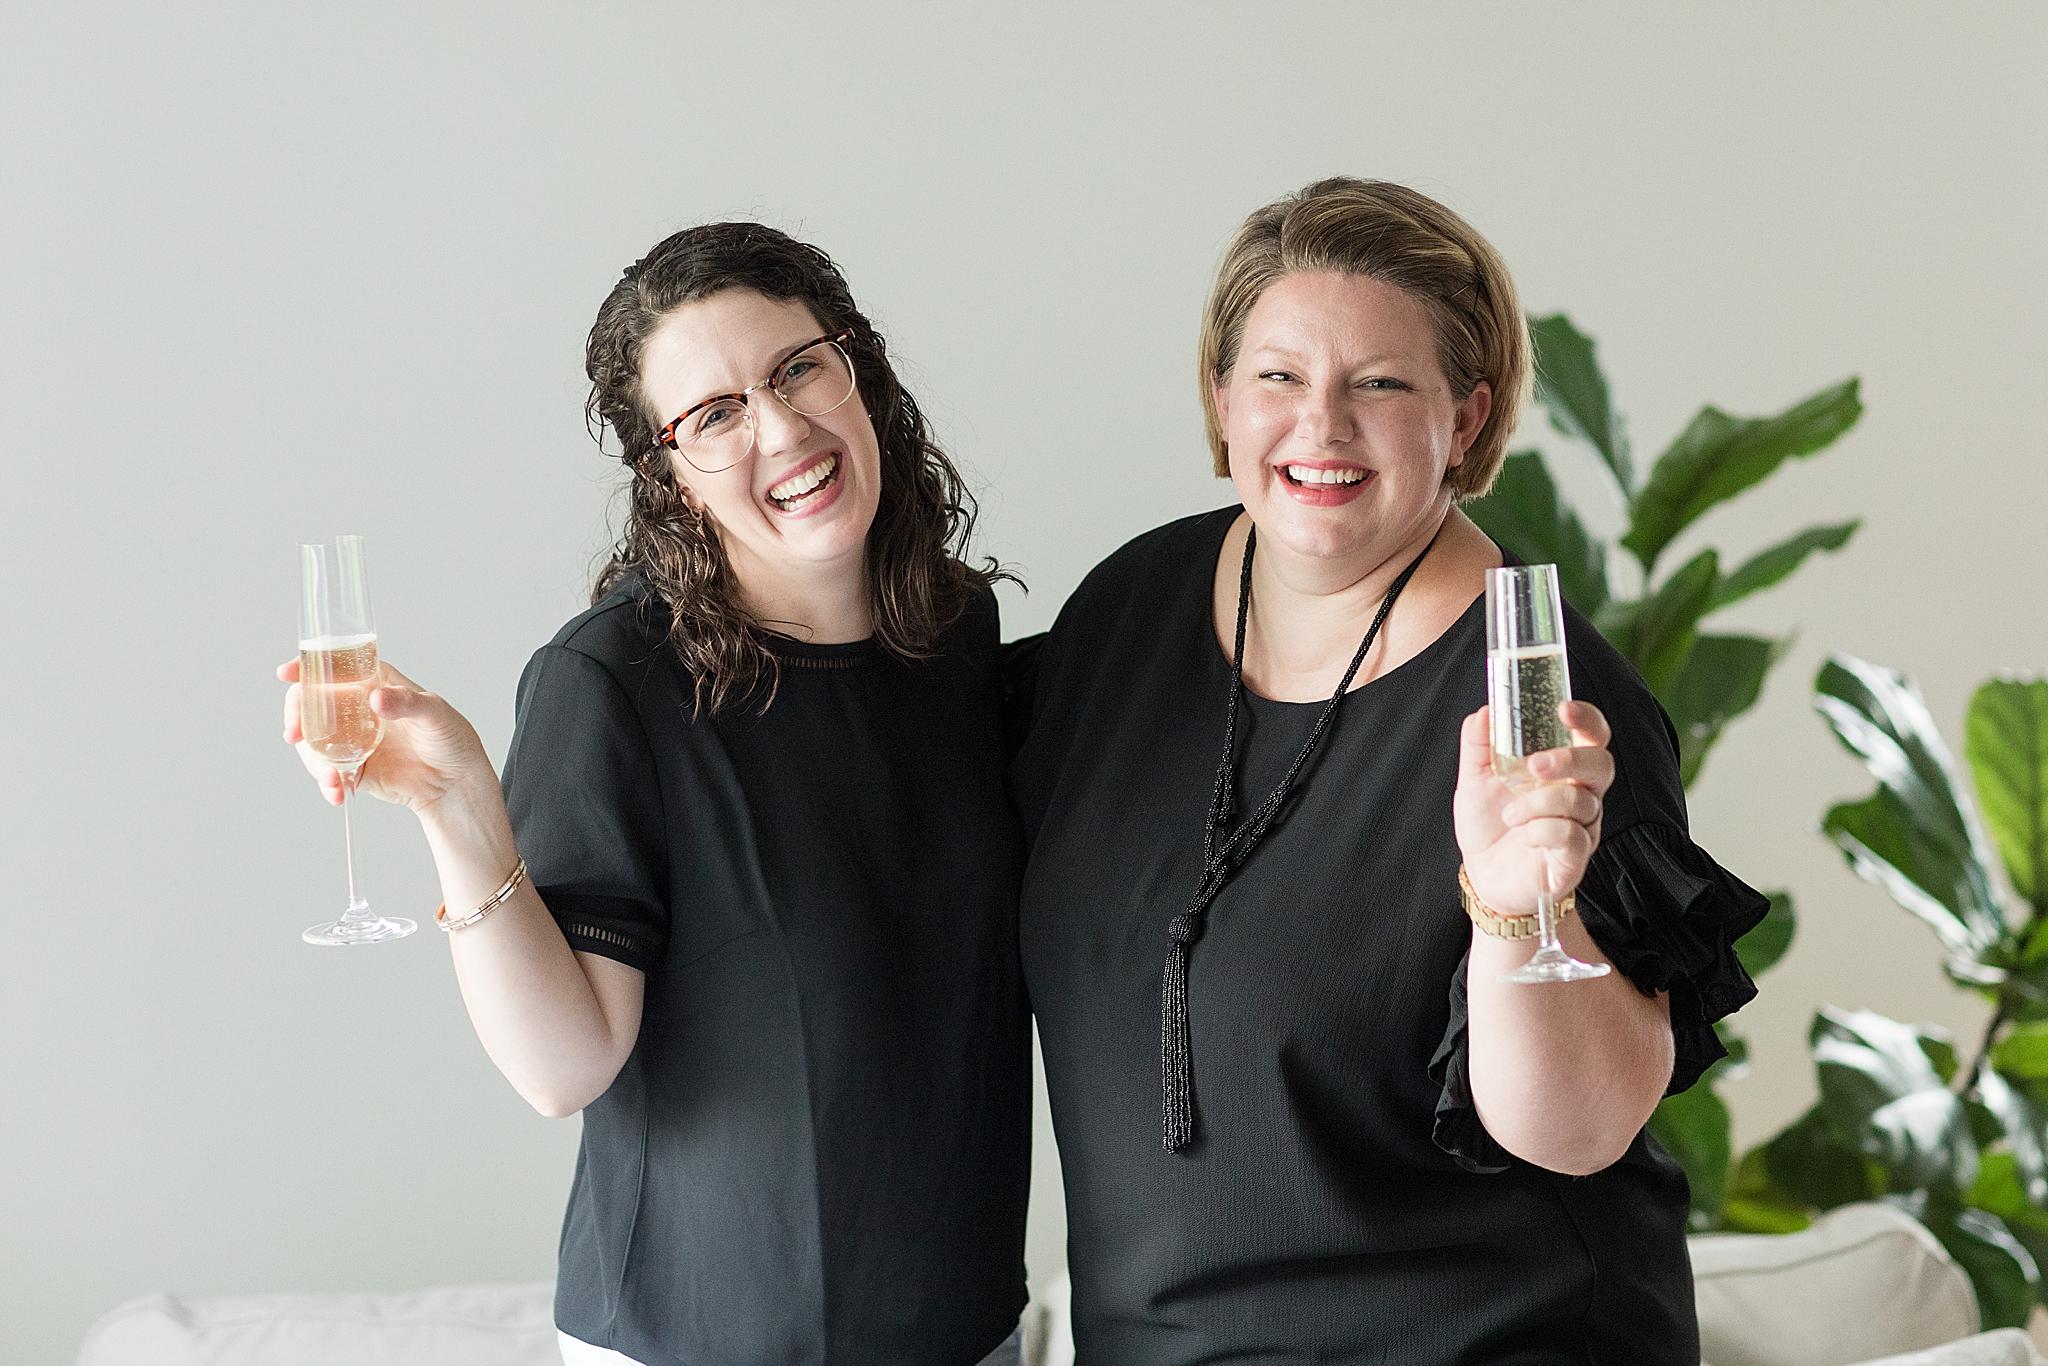 Alabama wedding photographers toast new clients